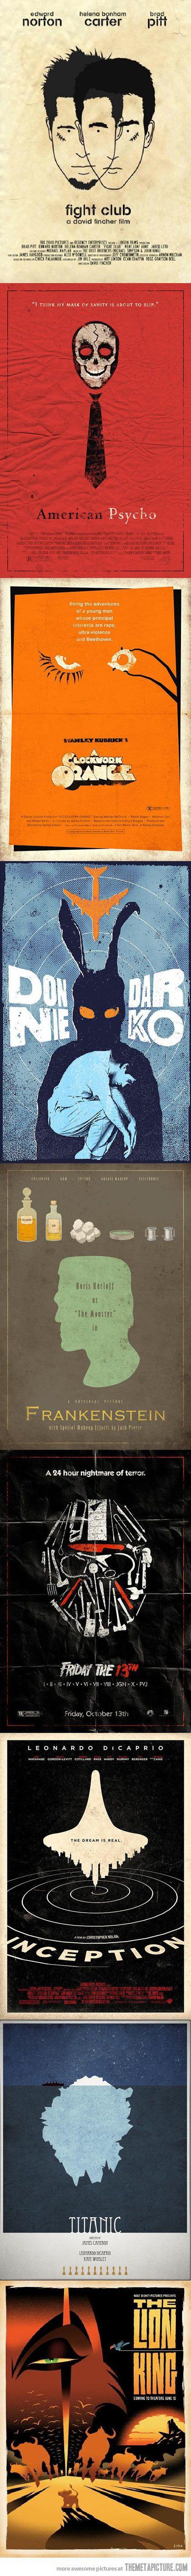 New Tombstone Fighting Movie Art Silk Poster 12x18 24x36